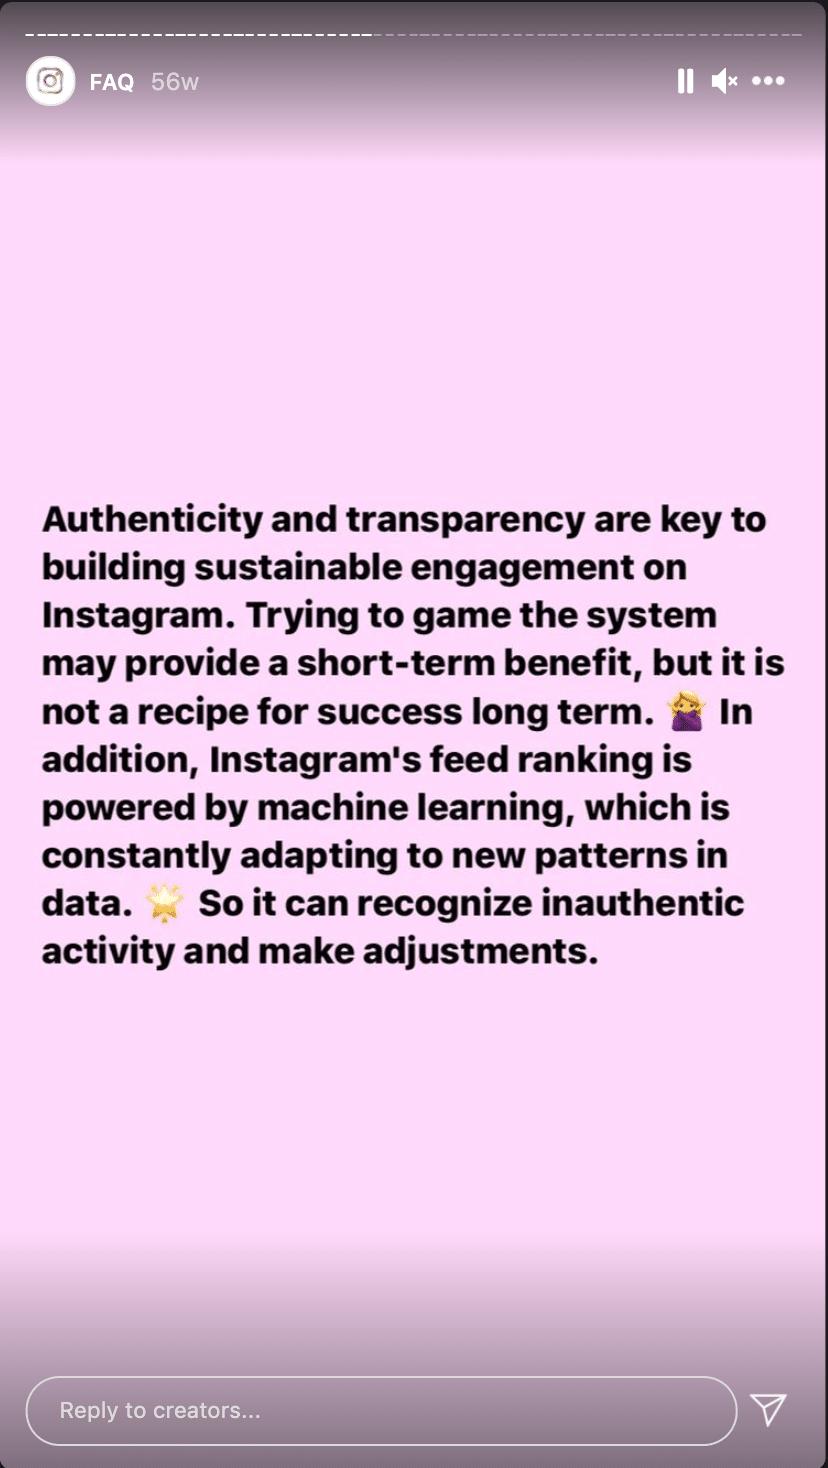 Instagram Creators Q&A inauthentic content question